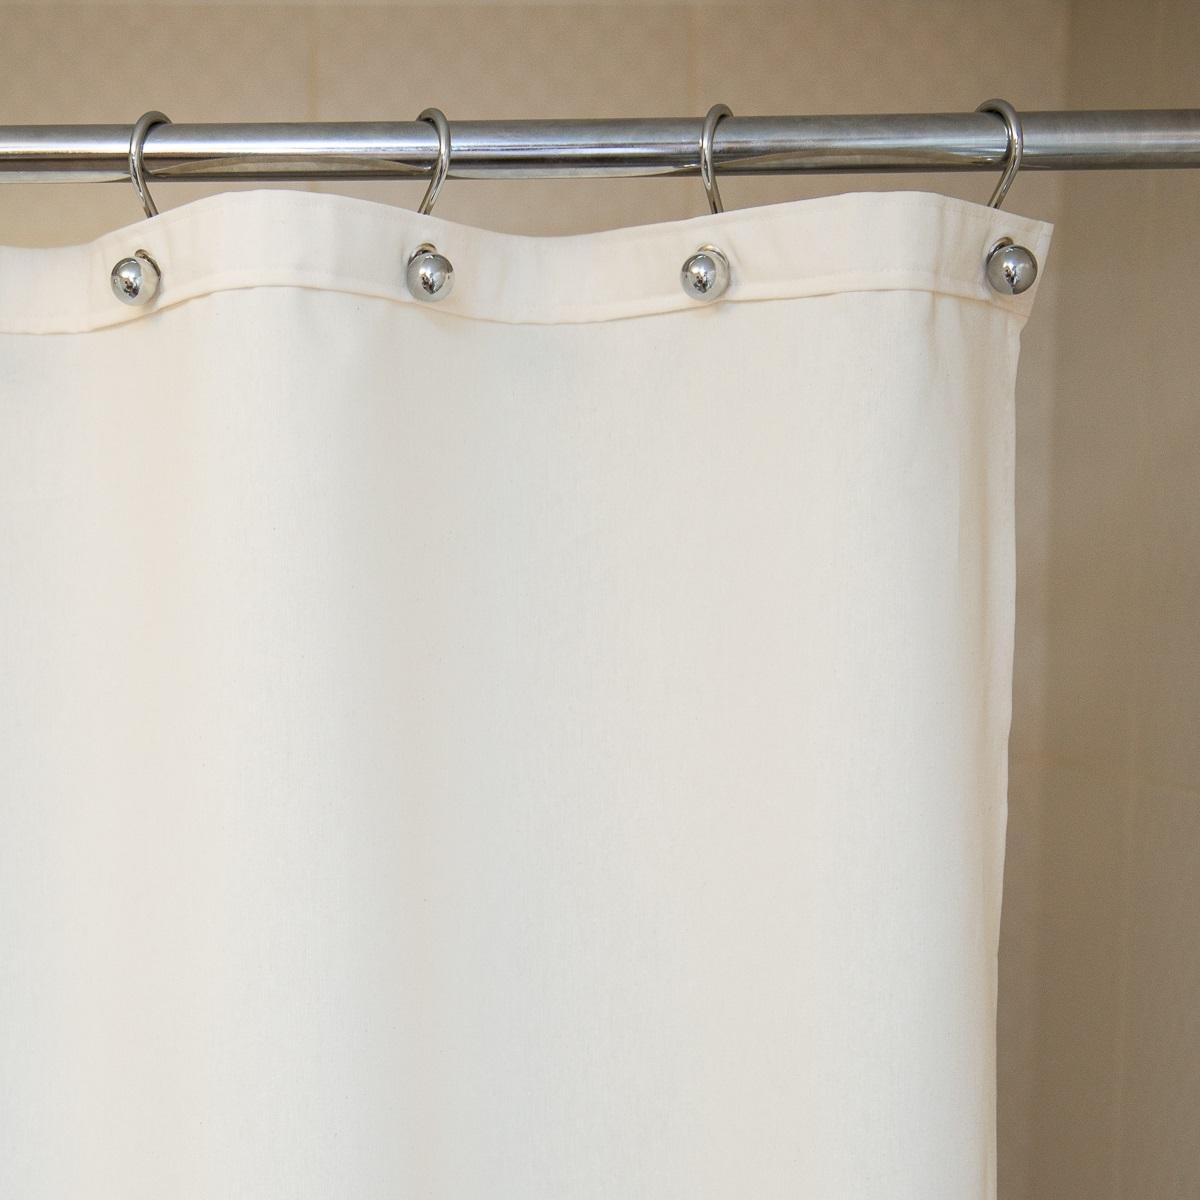 Защитная шторка для ванной 180х200 Liso Beige от Arti-Deco